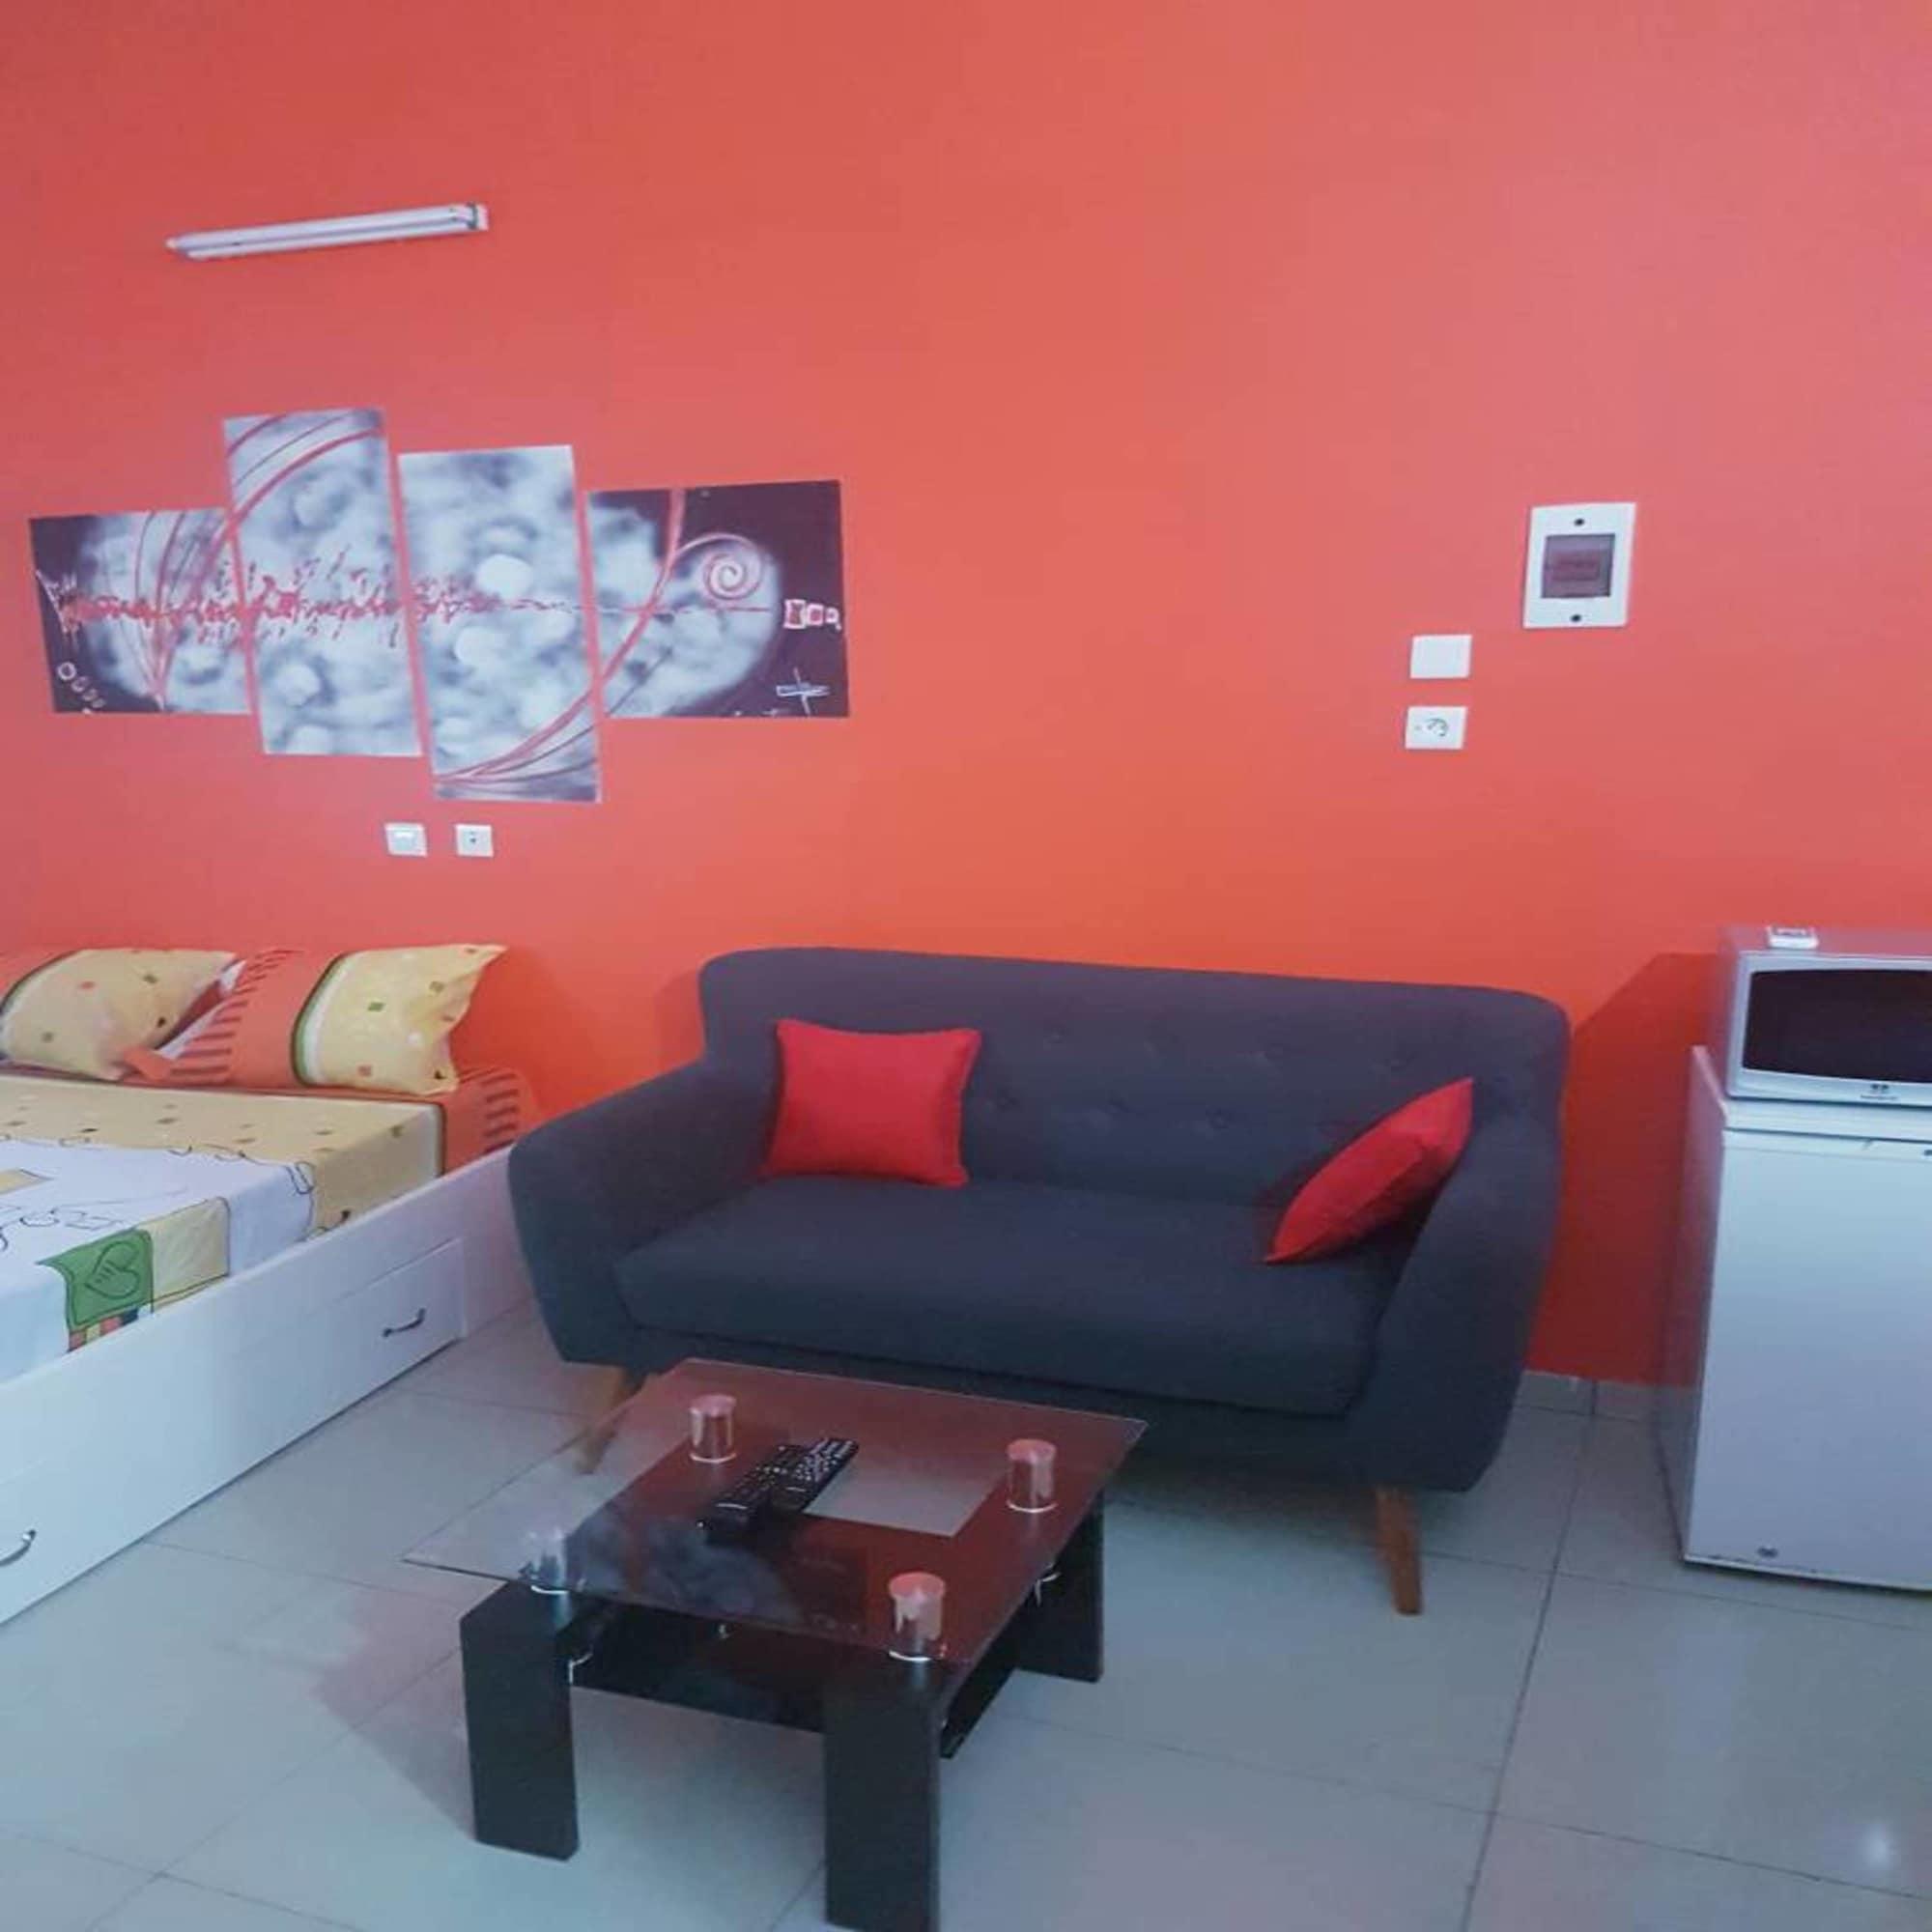 Les Résidences Rima 7, Abidjan